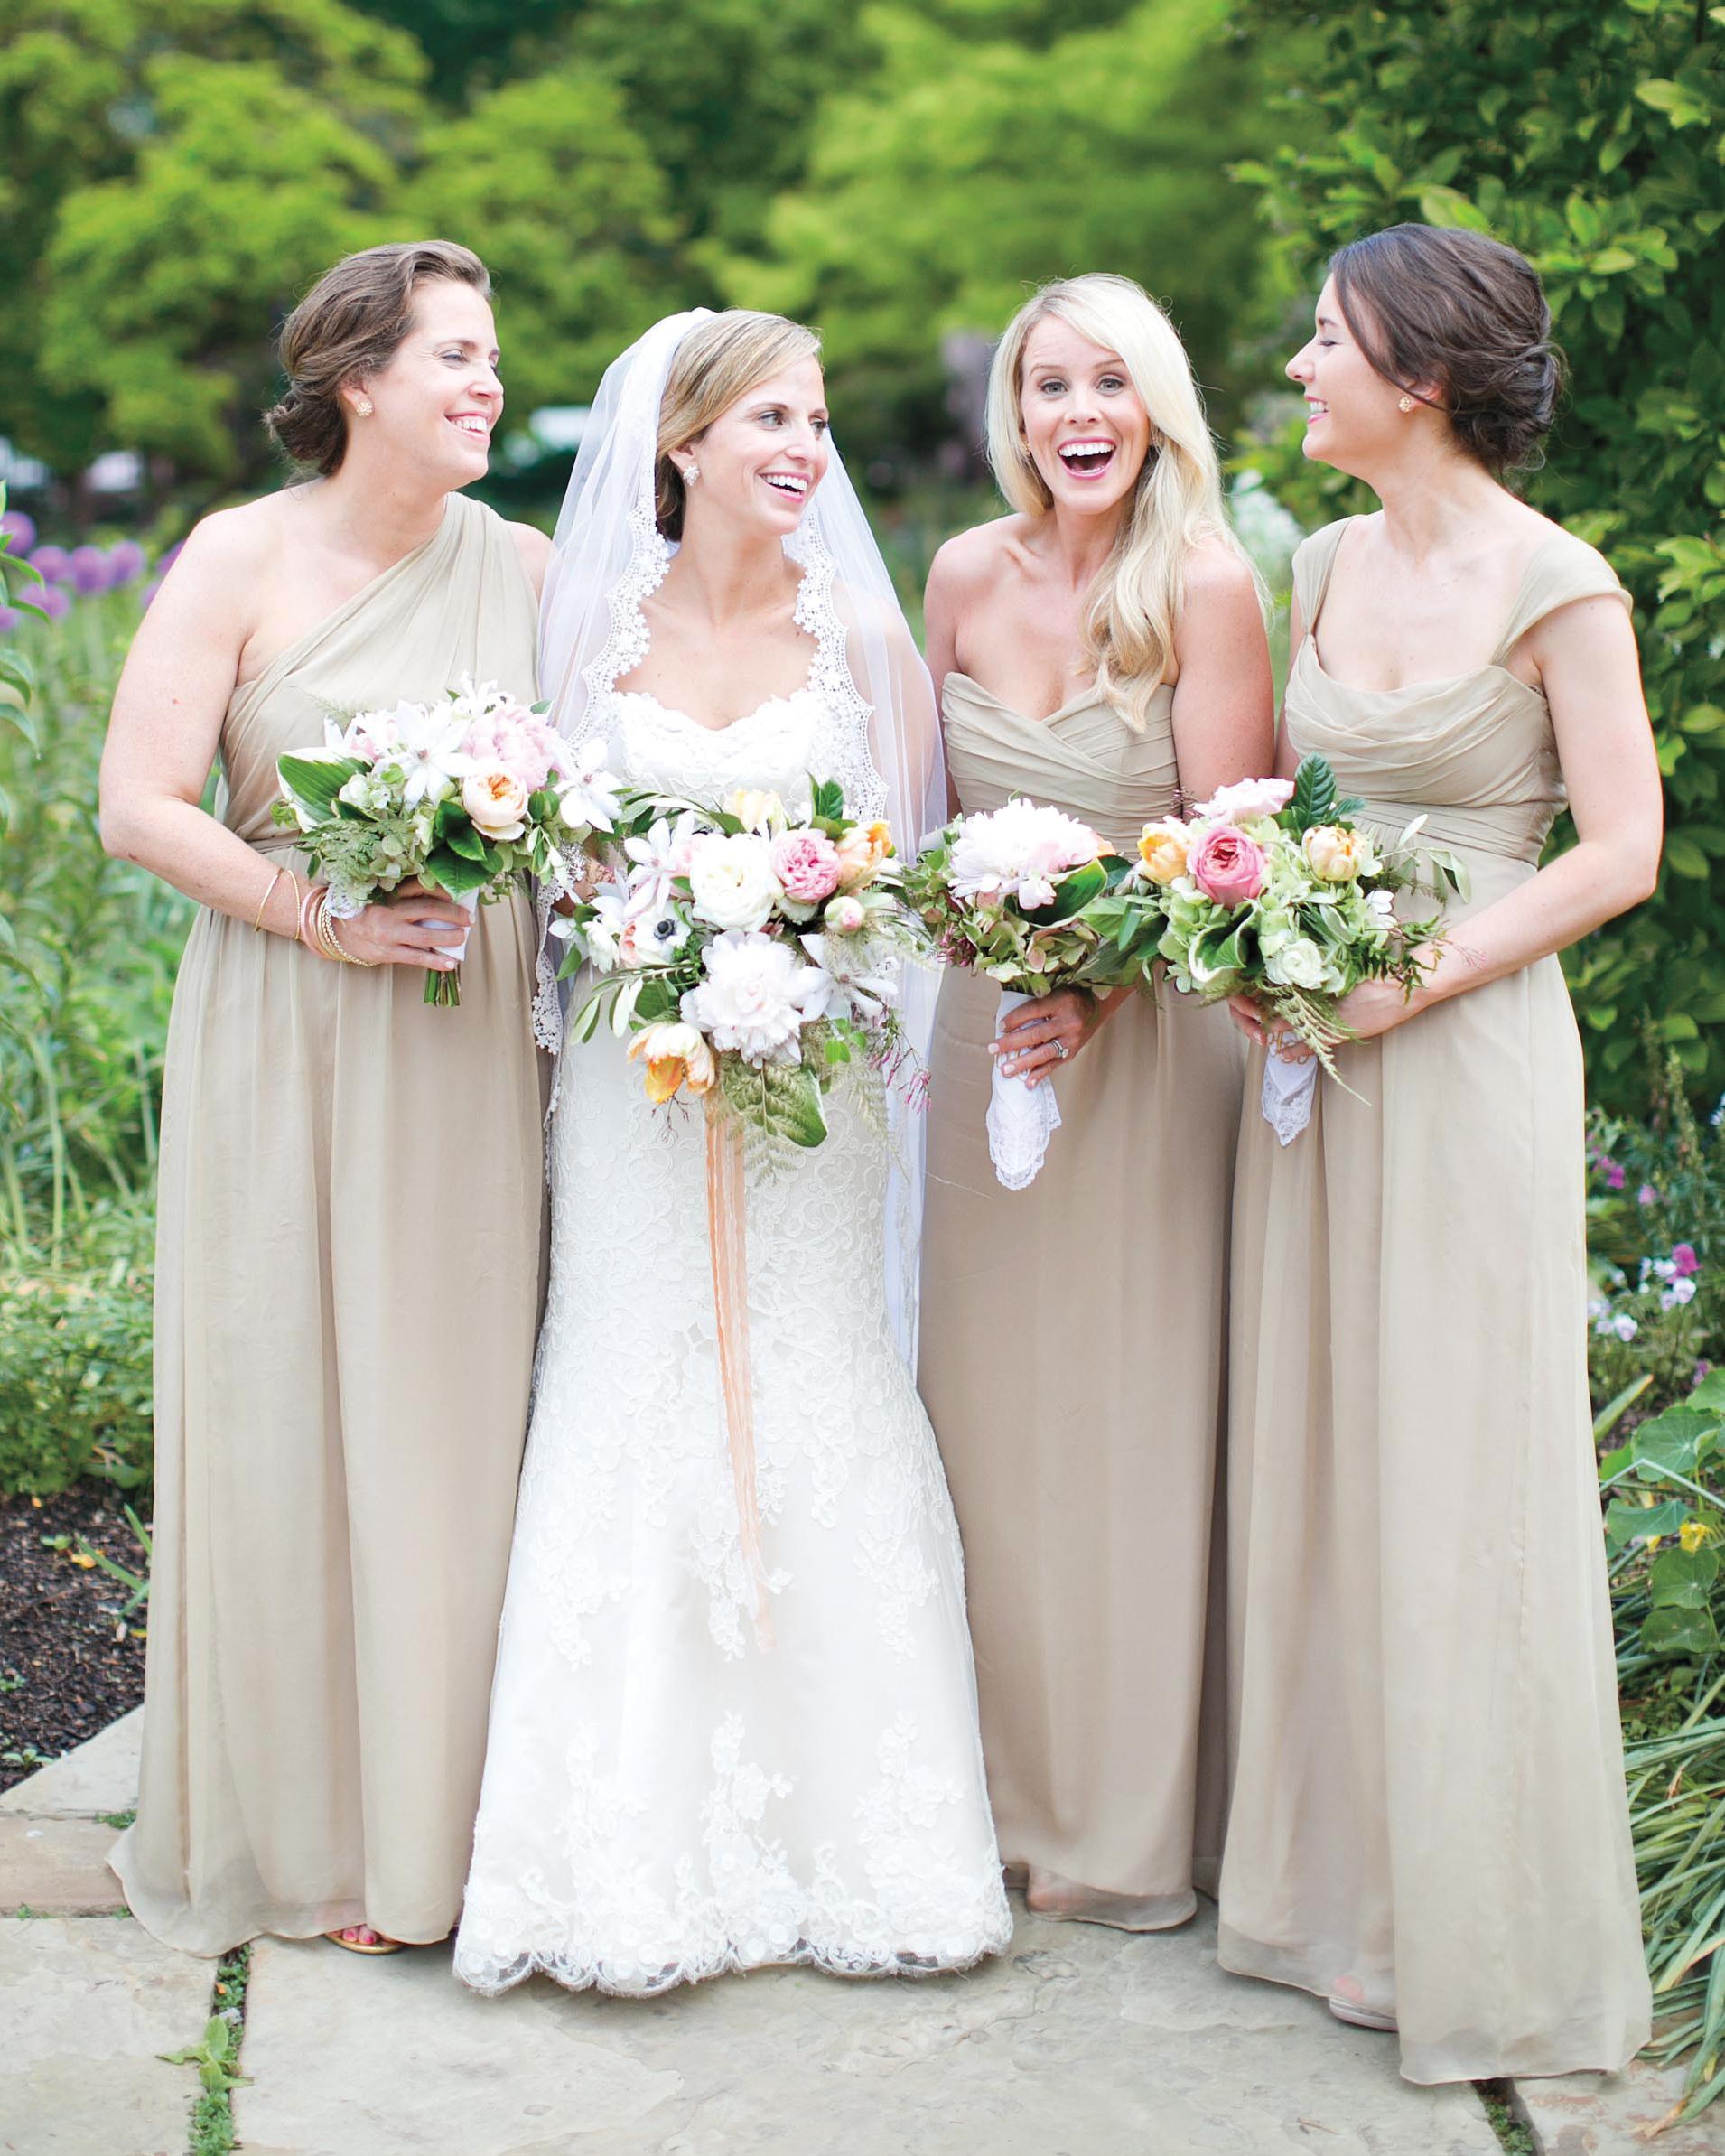 courtney-michael-bridal-party-56-s111677.jpg